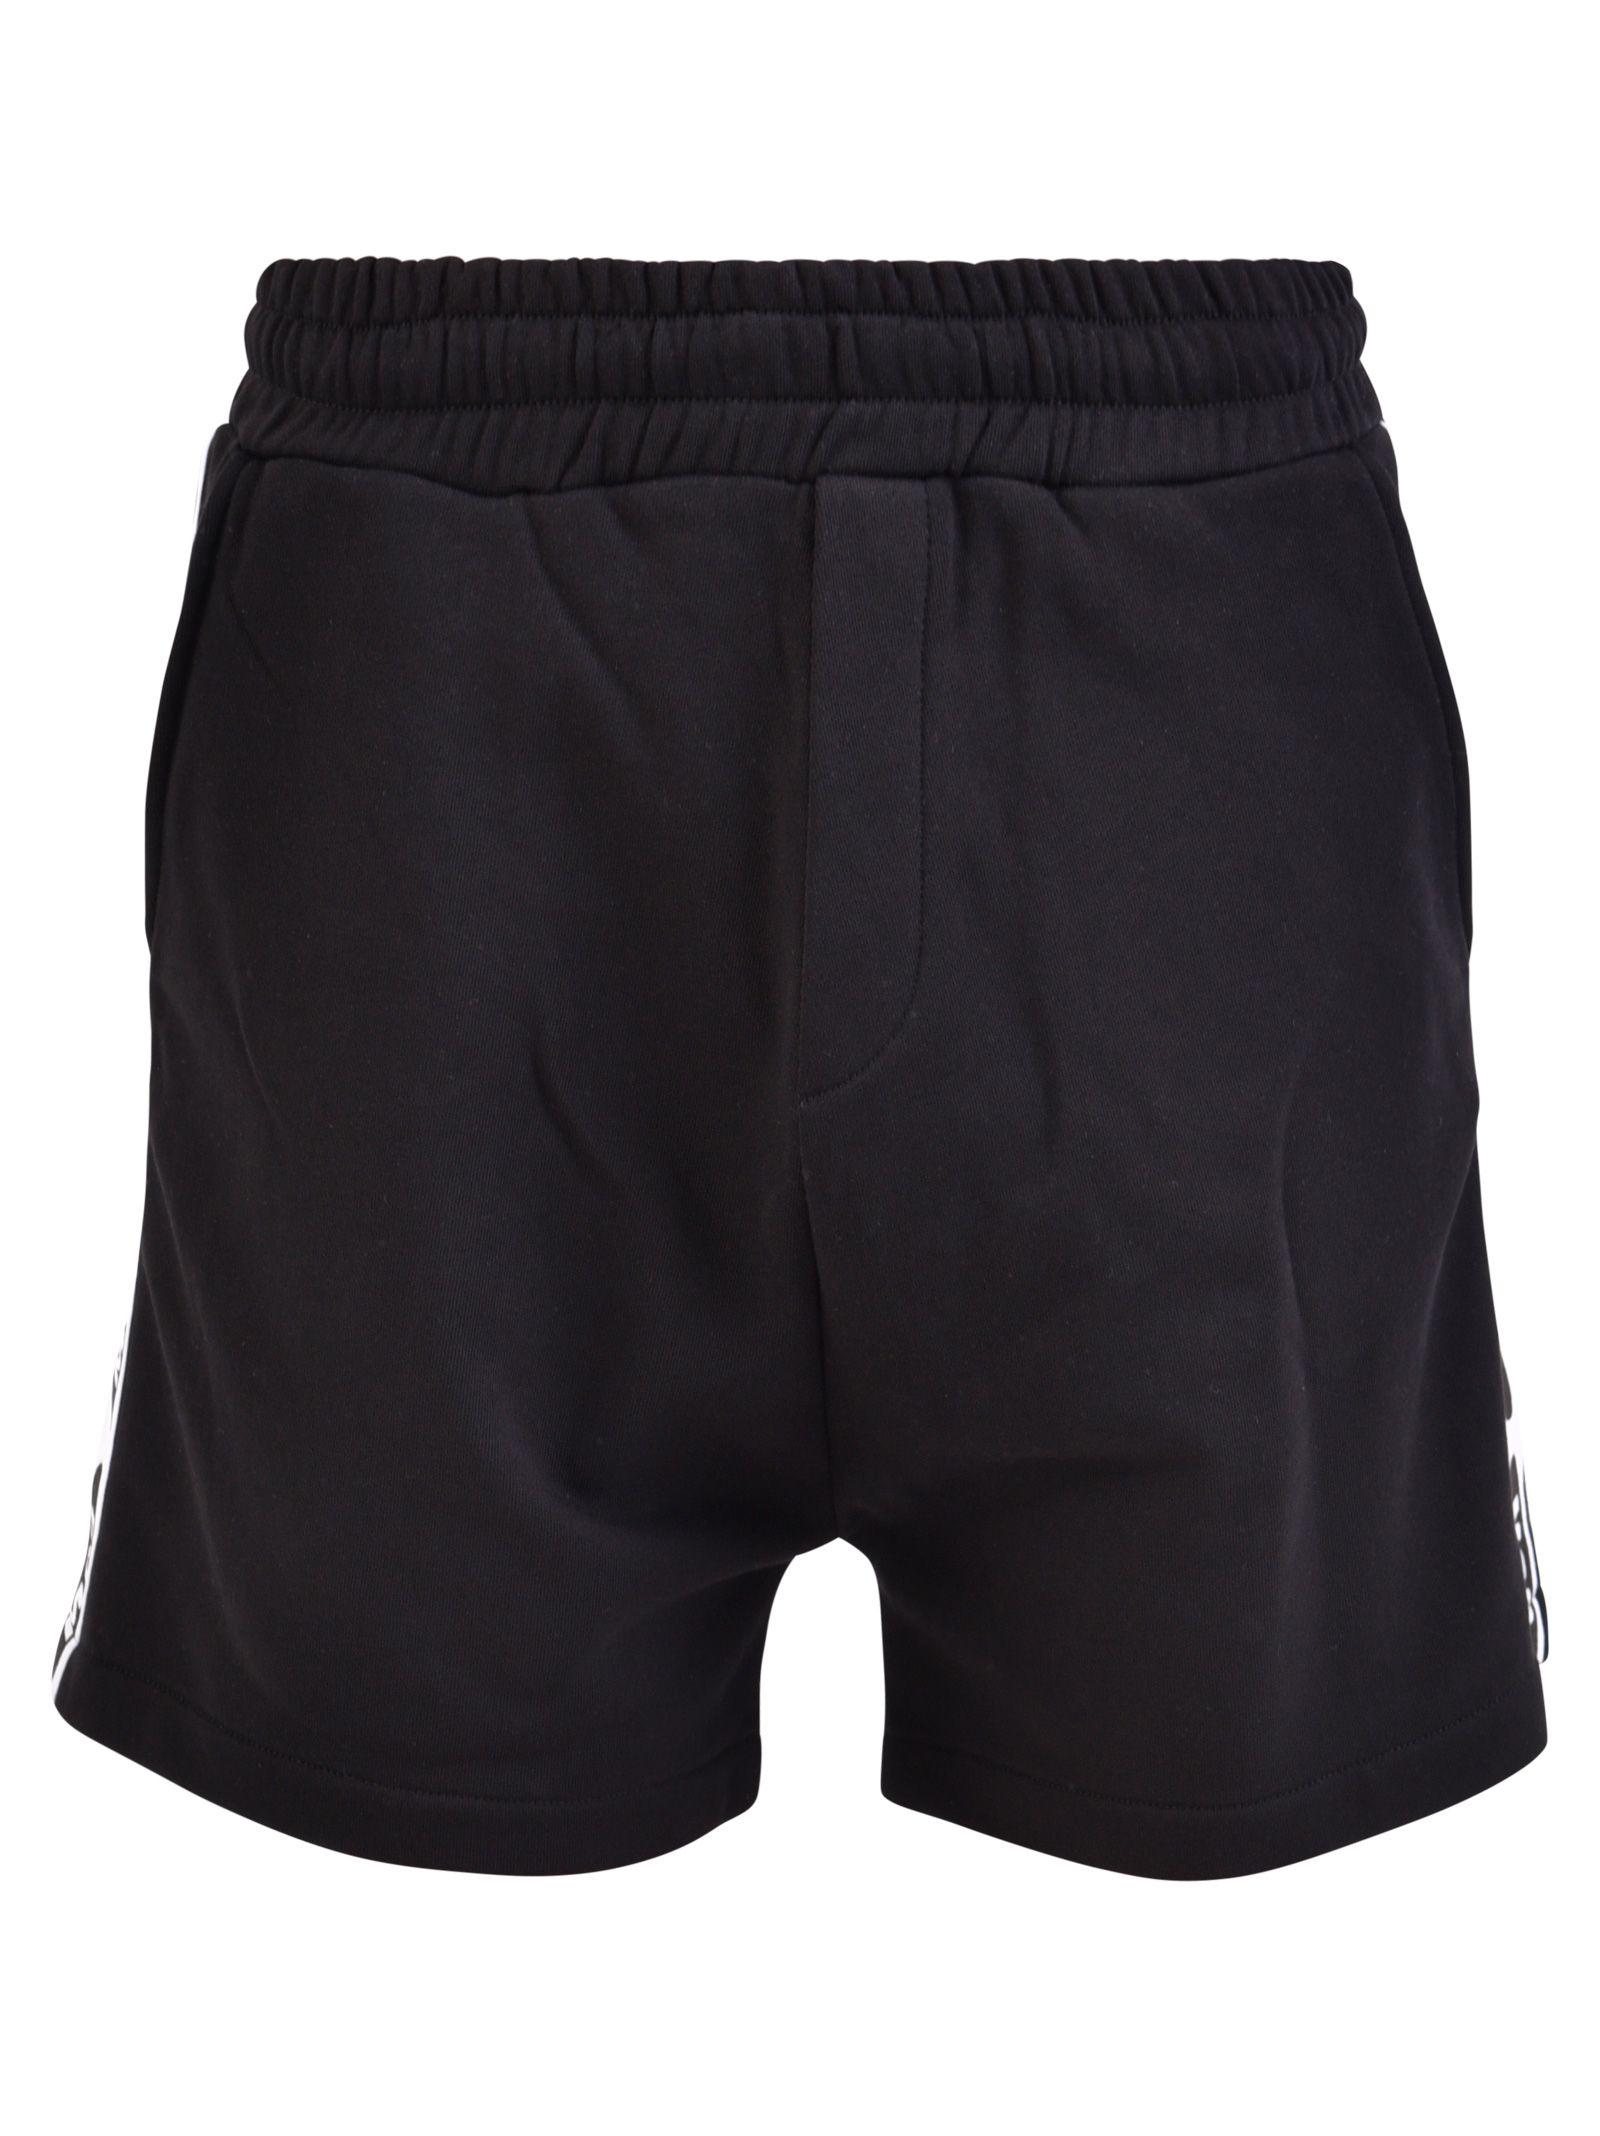 McQ Alexander McQueen Branded Shorts